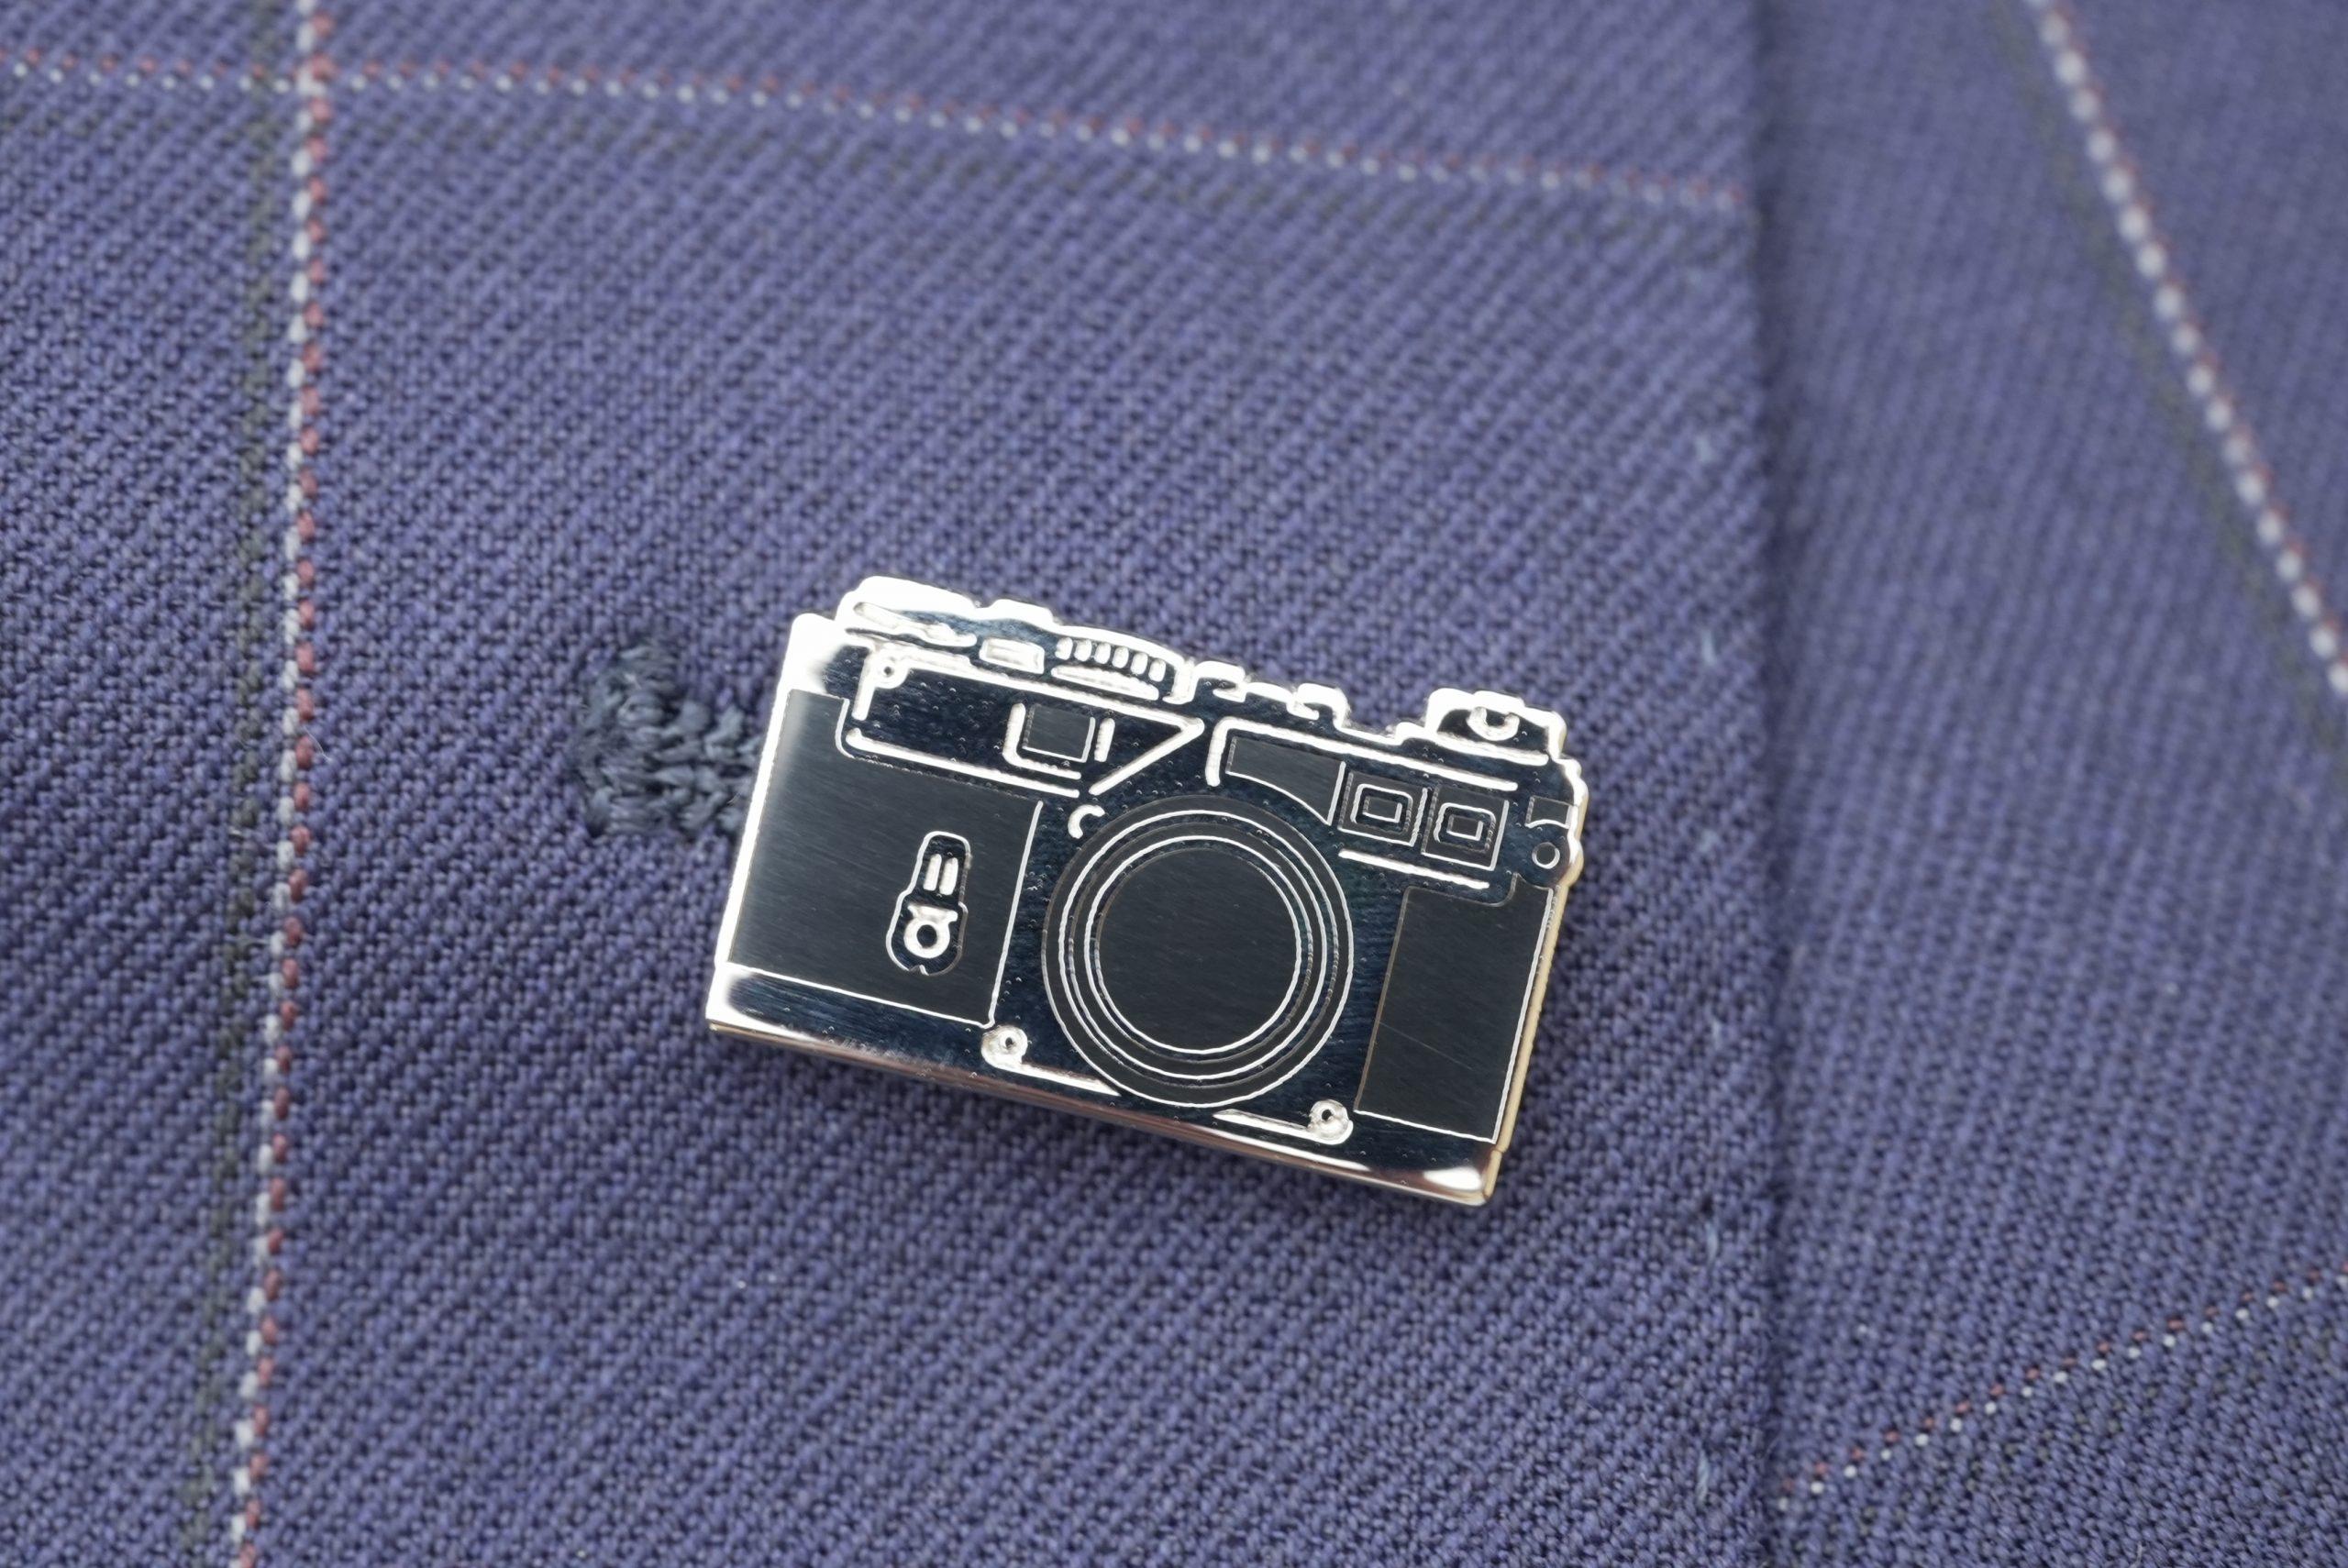 【Nikon】マップカメラ限定 ピンバッジプレゼント